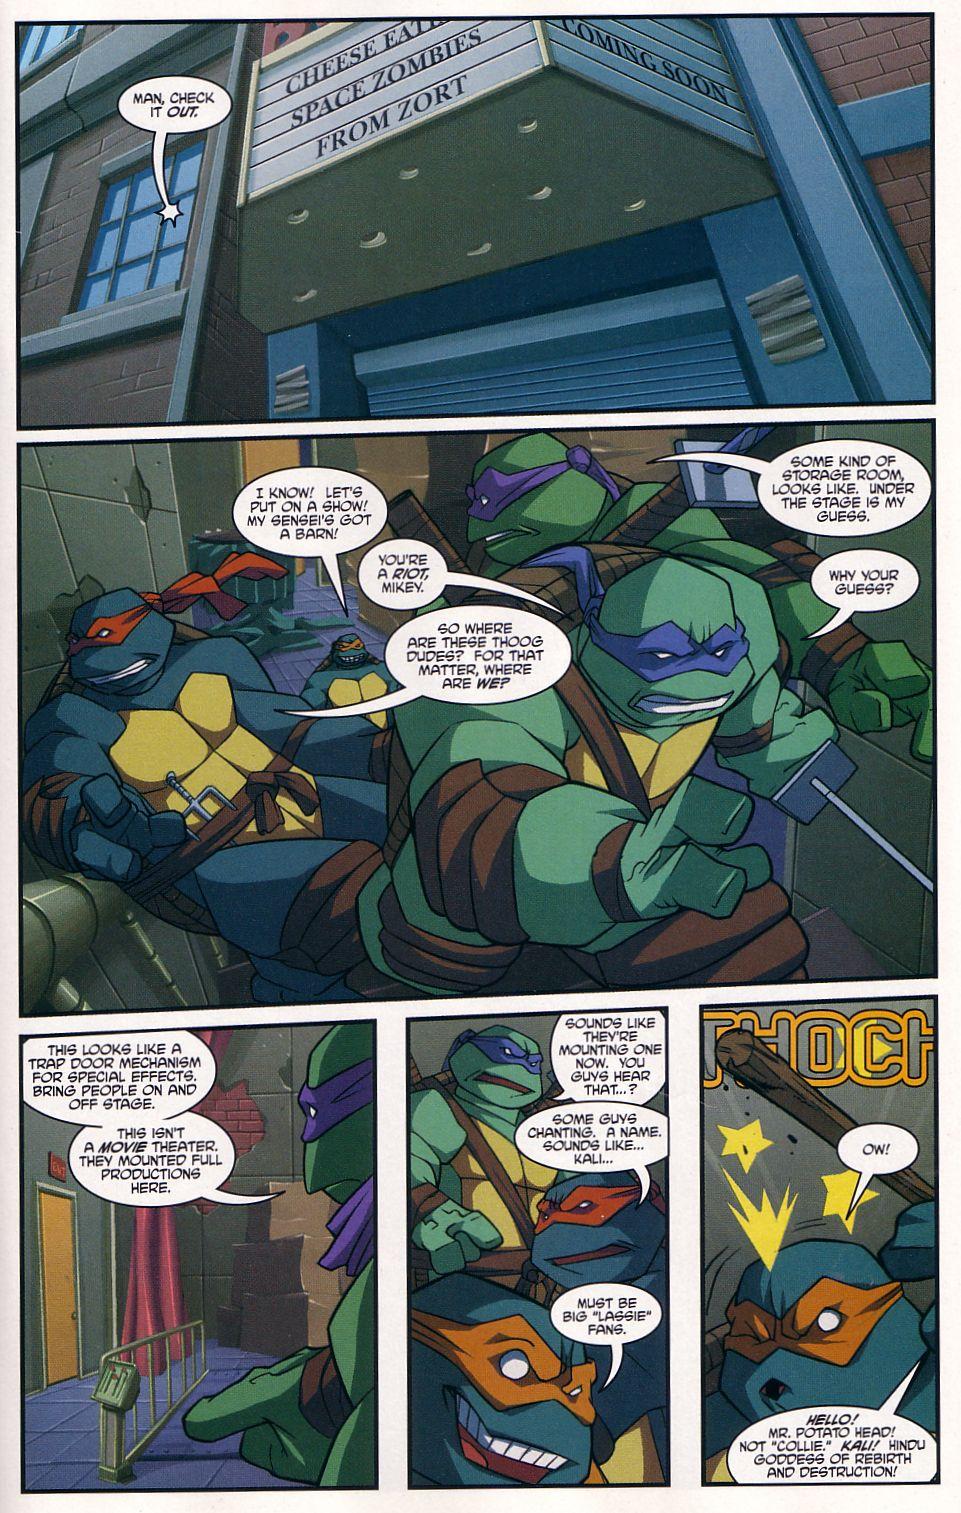 Teenage Mutant Ninja Turtles (2003) chap 7 pic 15